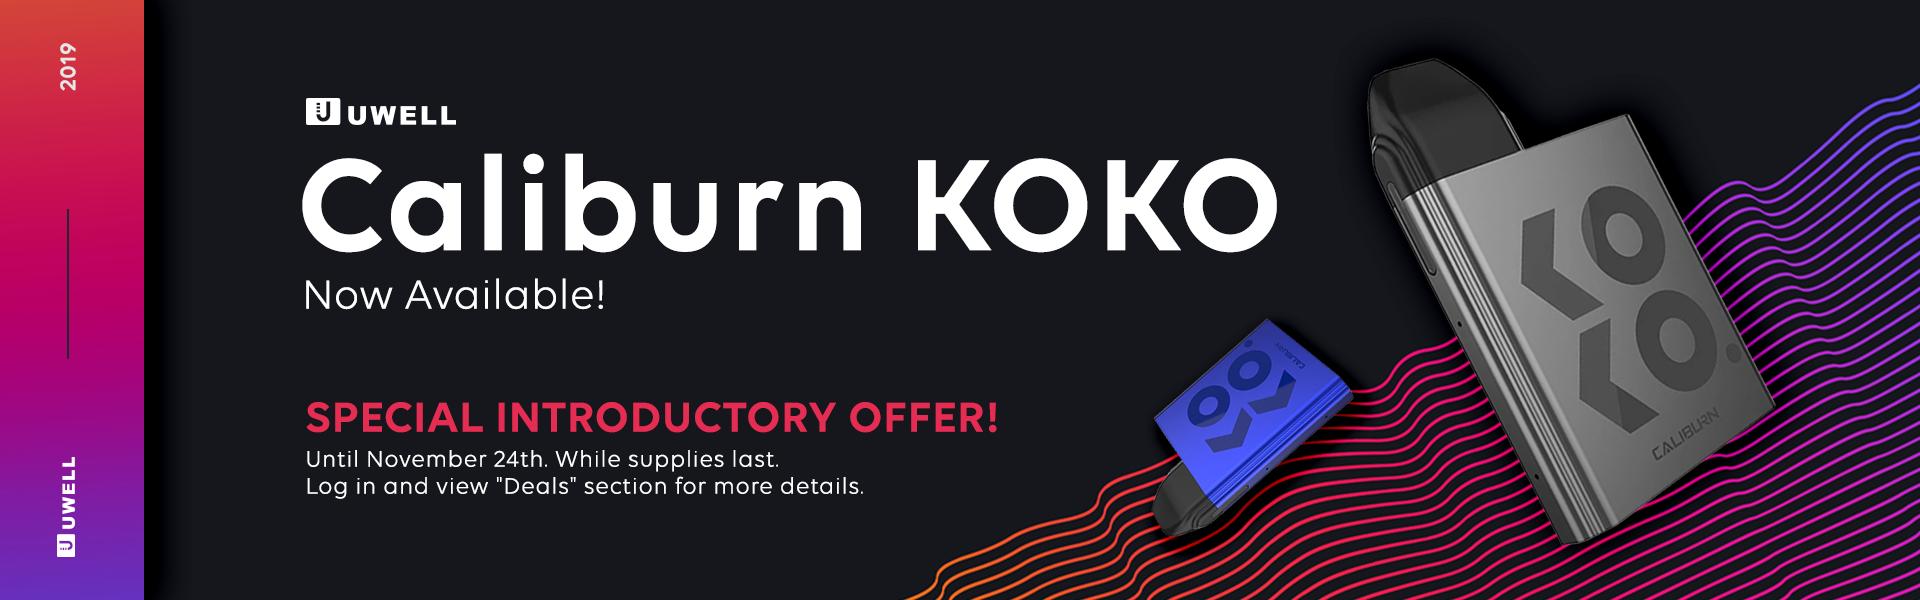 Uwell Caliburn KOKO Kit Now Available